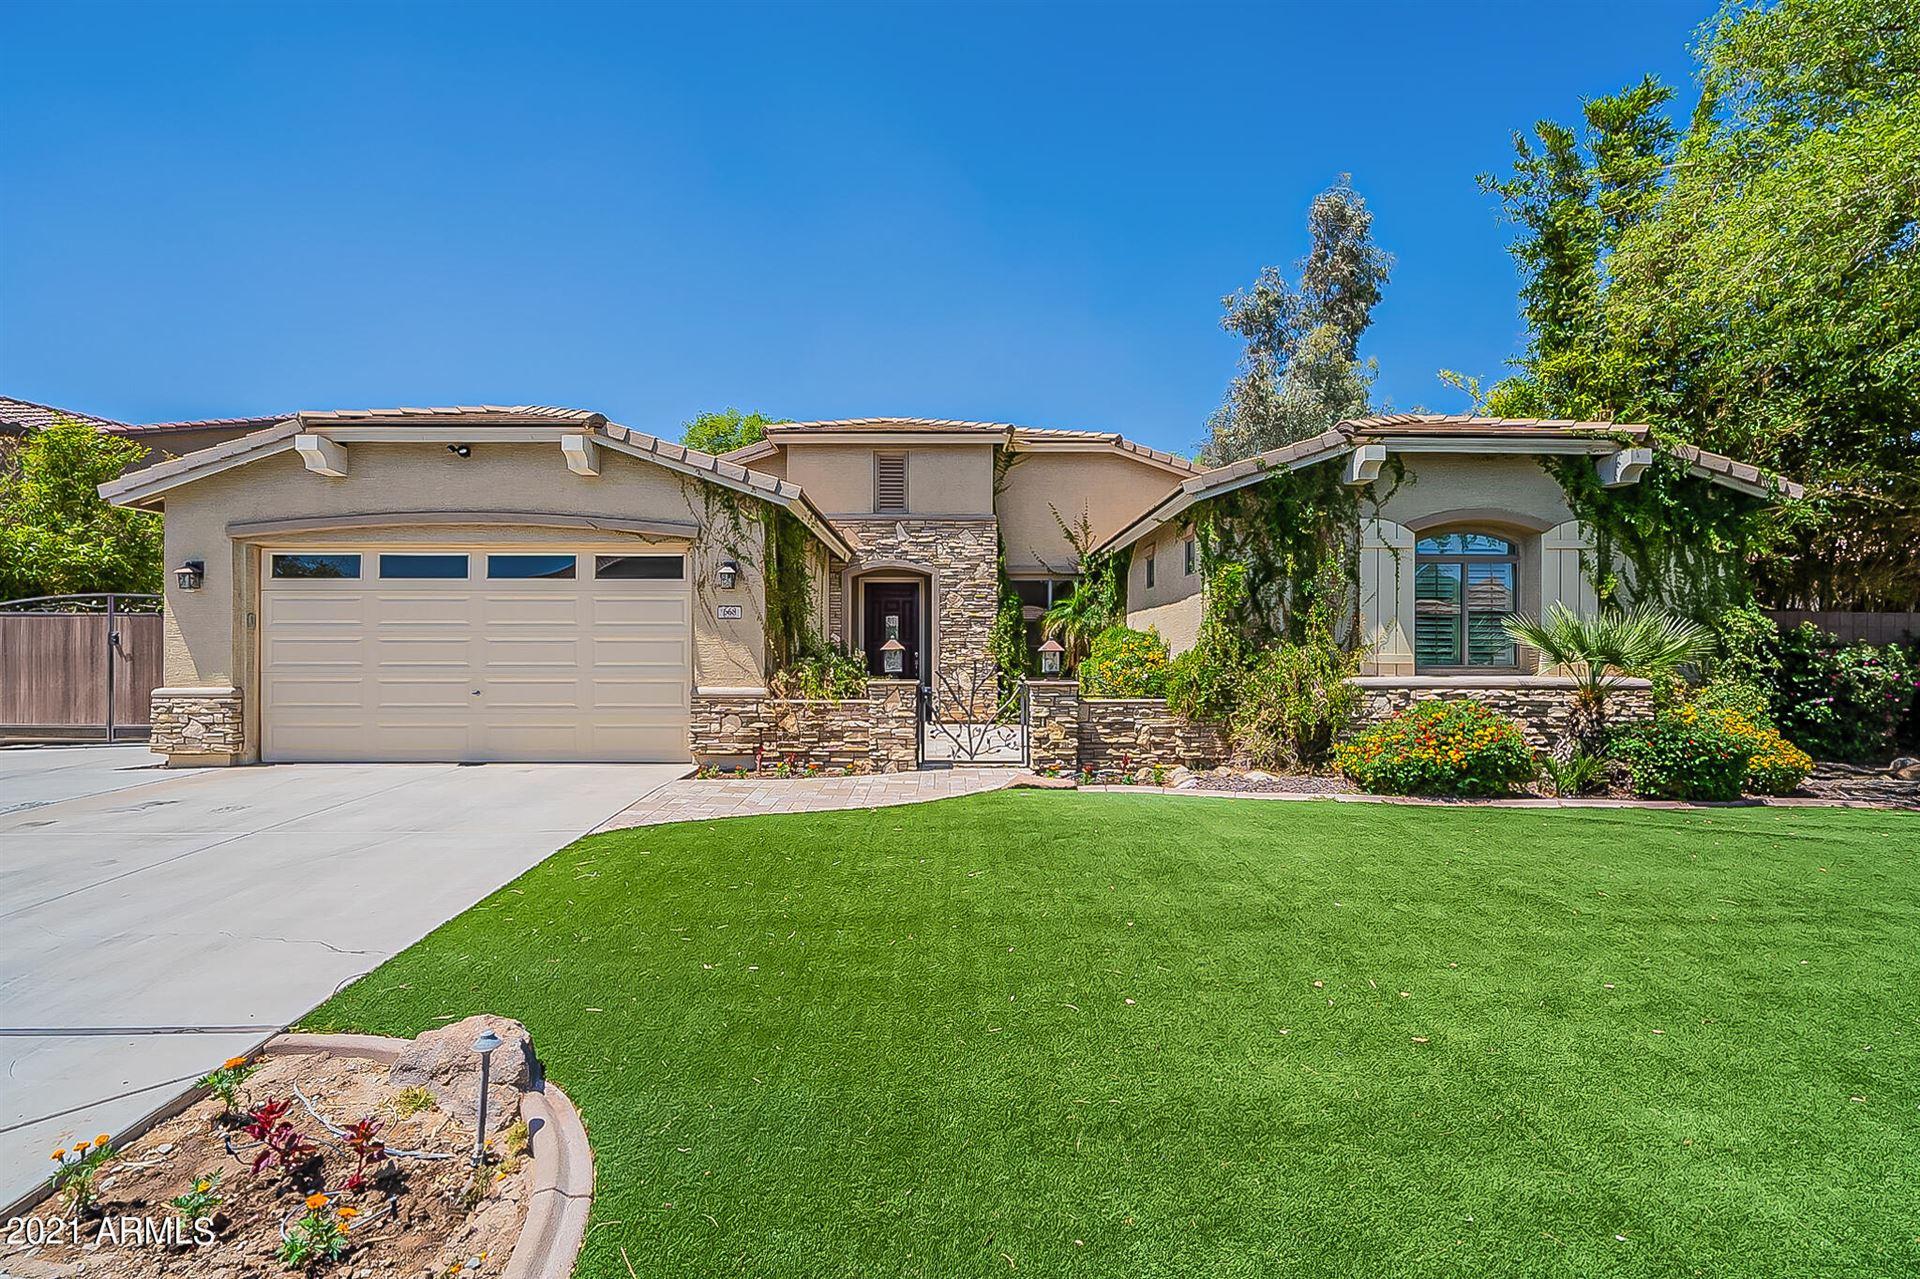 668 W BASSWOOD Avenue, Queen Creek, AZ 85140 - MLS#: 6231415